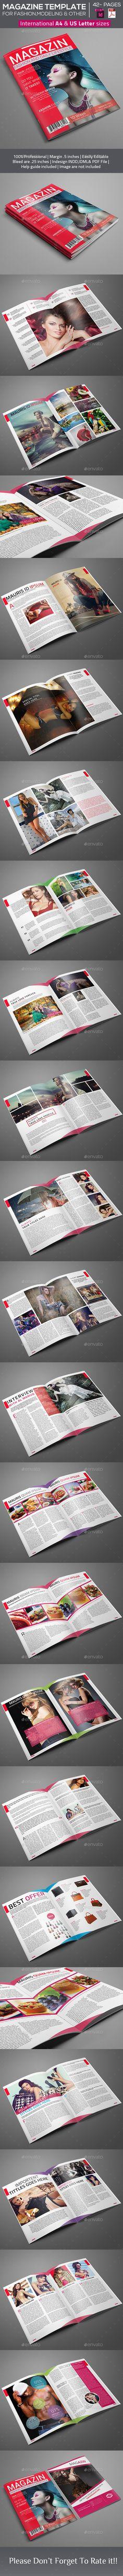 Magazine Template   #magazinetemplate   Download: http://graphicriver.net/item/magazine-template-/10061194?ref=ksioks